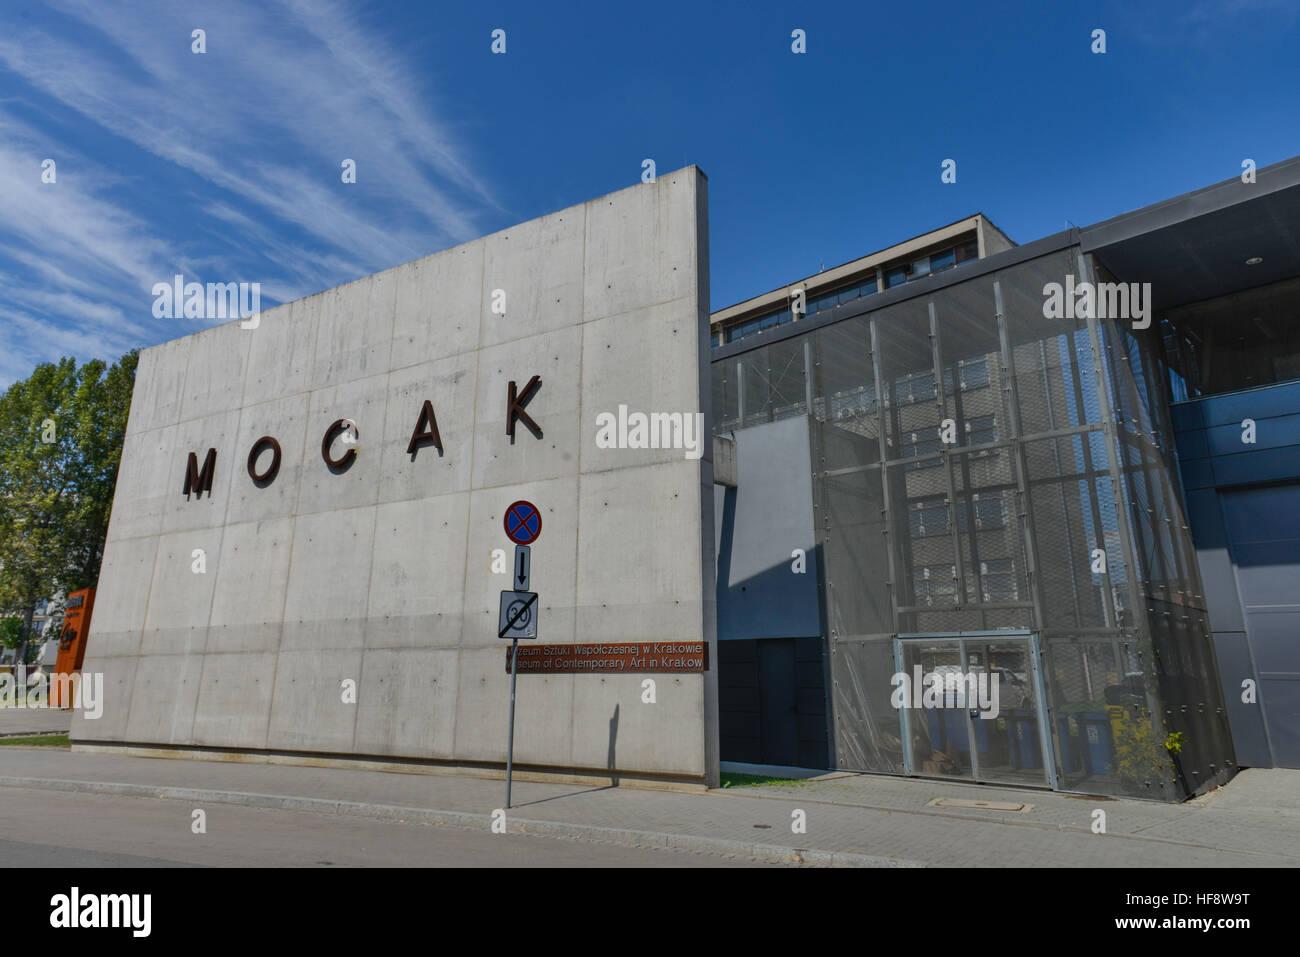 MOCAK, Museum, Lipowa, Krakau, Polen, museum, Cracow, Poland Stock Photo